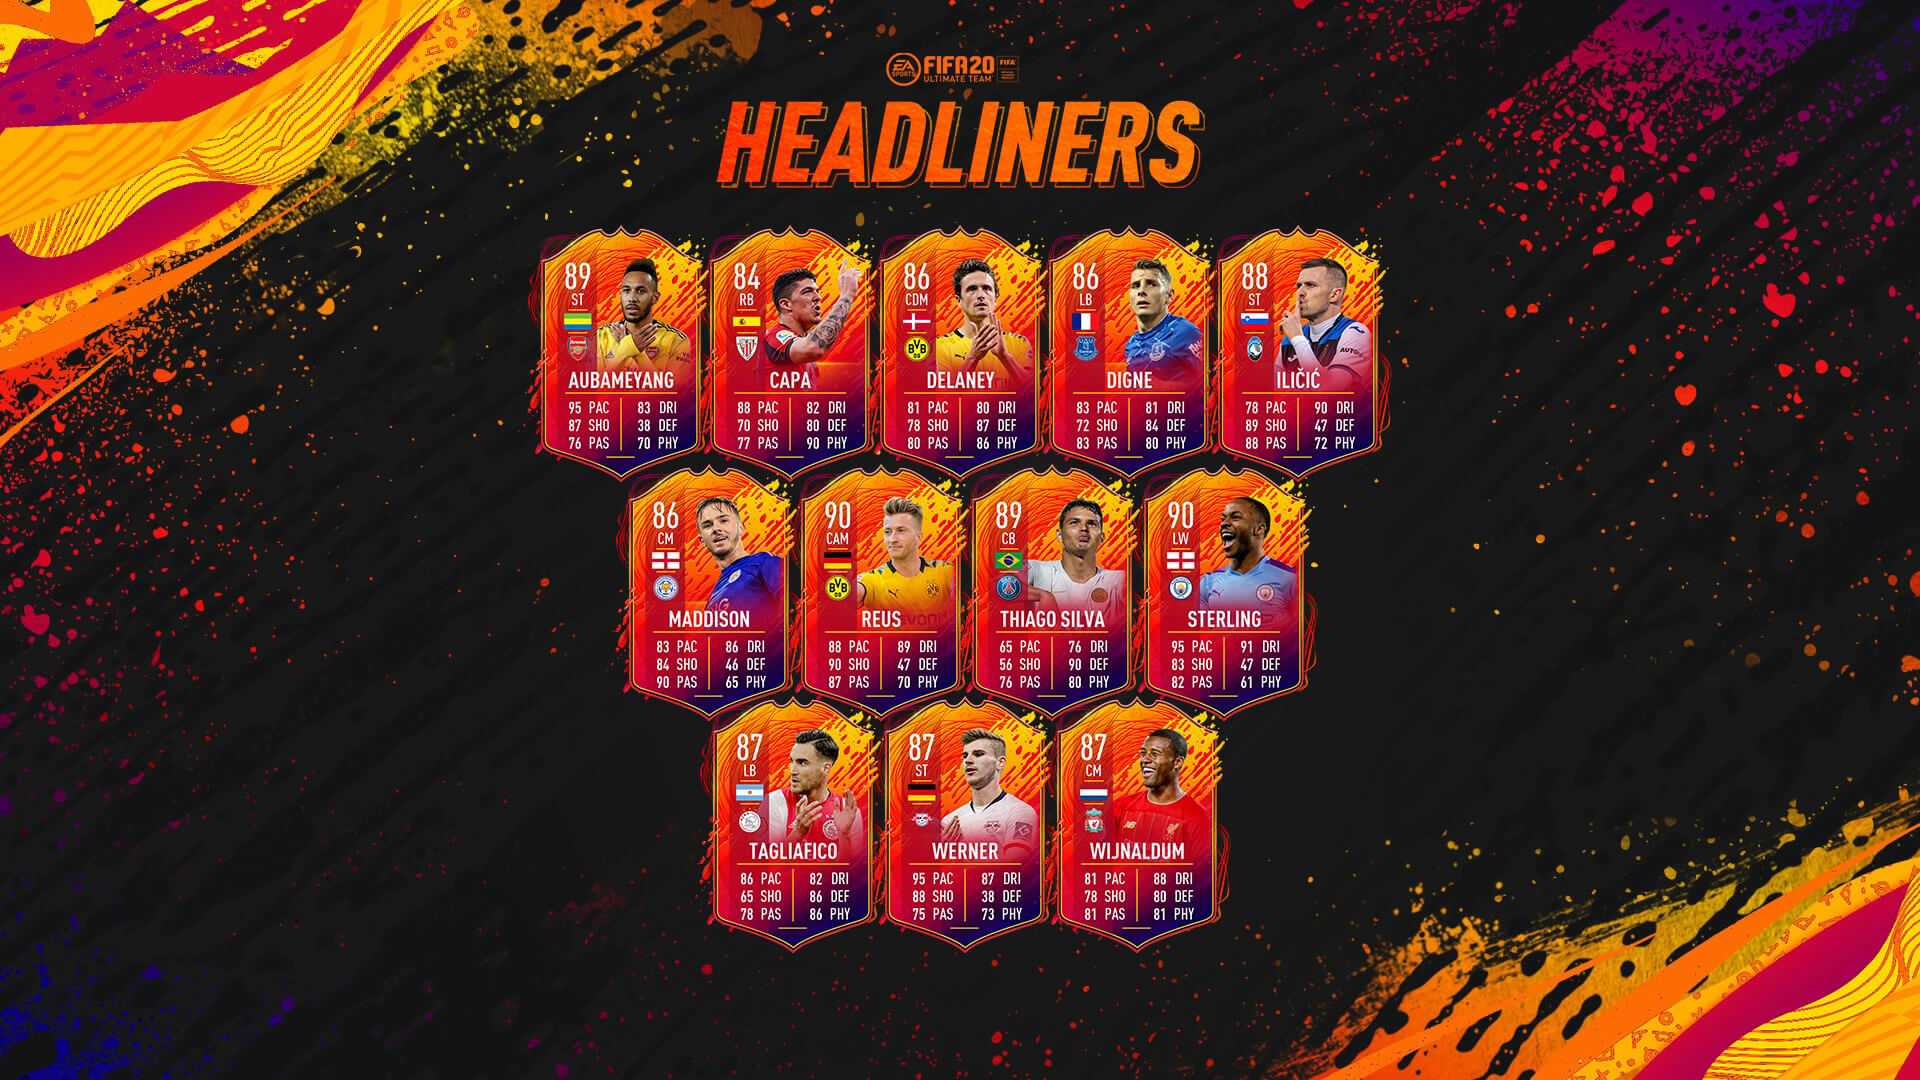 Segundo equipo de Headliners de FIFA 20 Ultimate Team